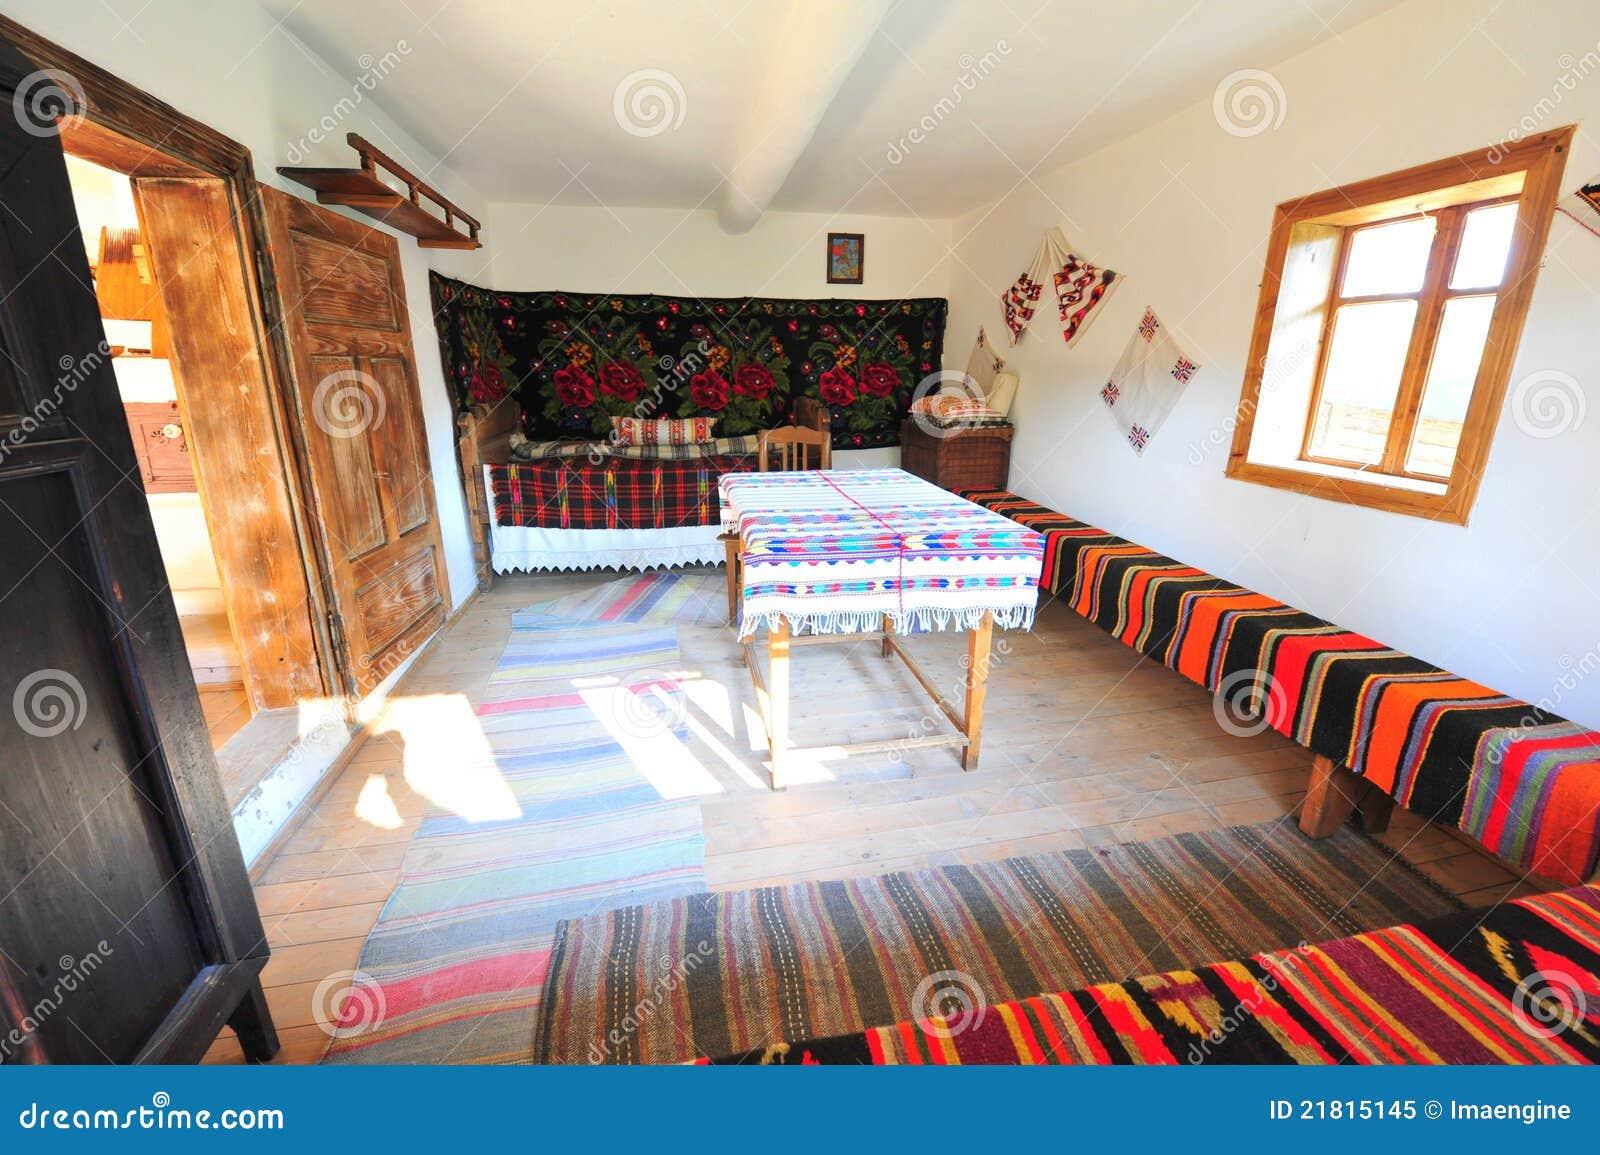 Traditional Rustic Rural Home Interior Romania Royalty